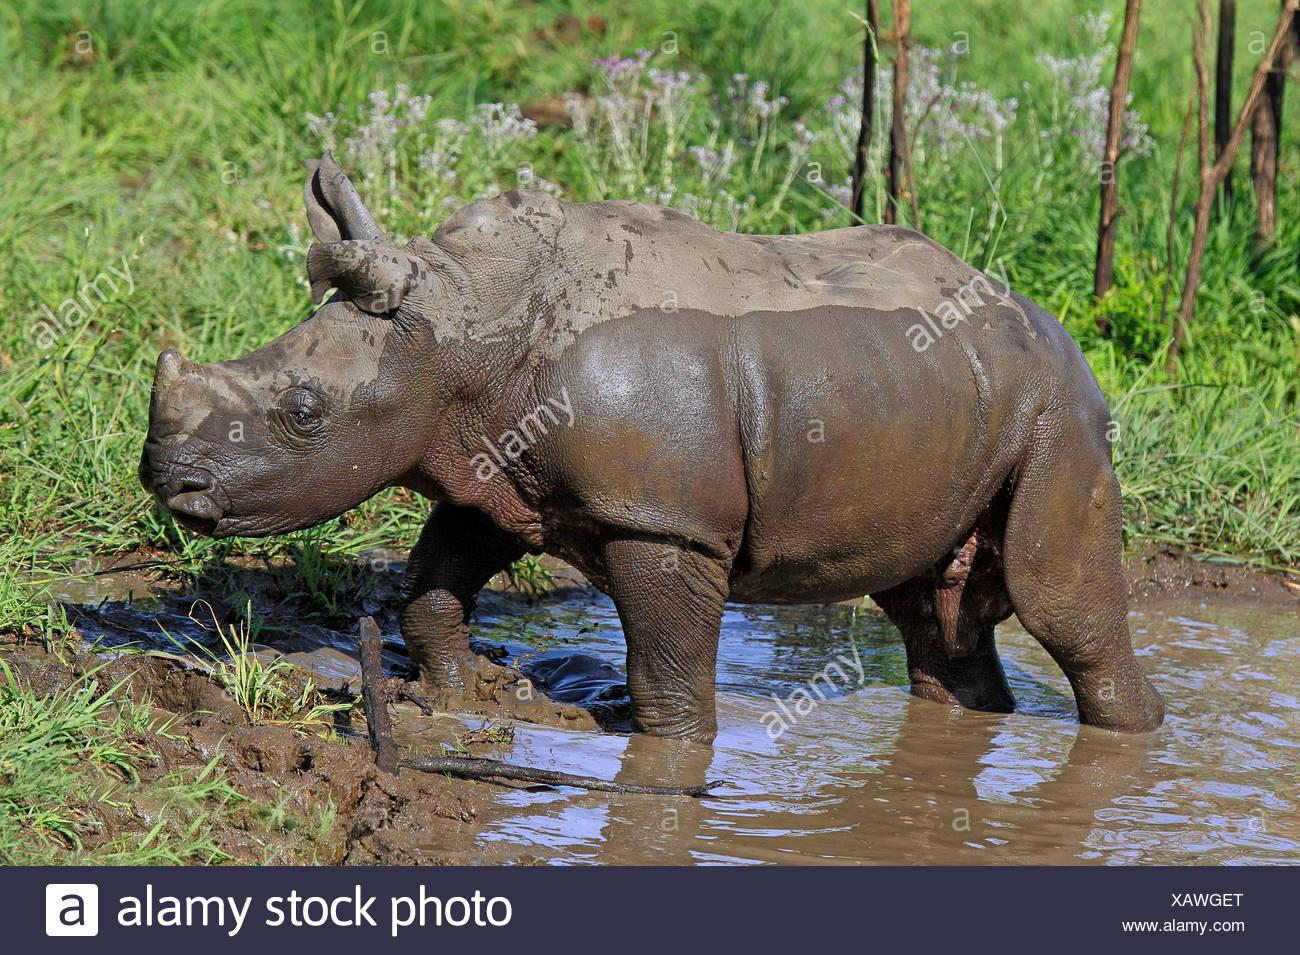 Wide-mouthed Rhinoceros, young after having mudbath, Sabi Sabi Game Reserve, Kruger national park, South Africa / - Stock Image